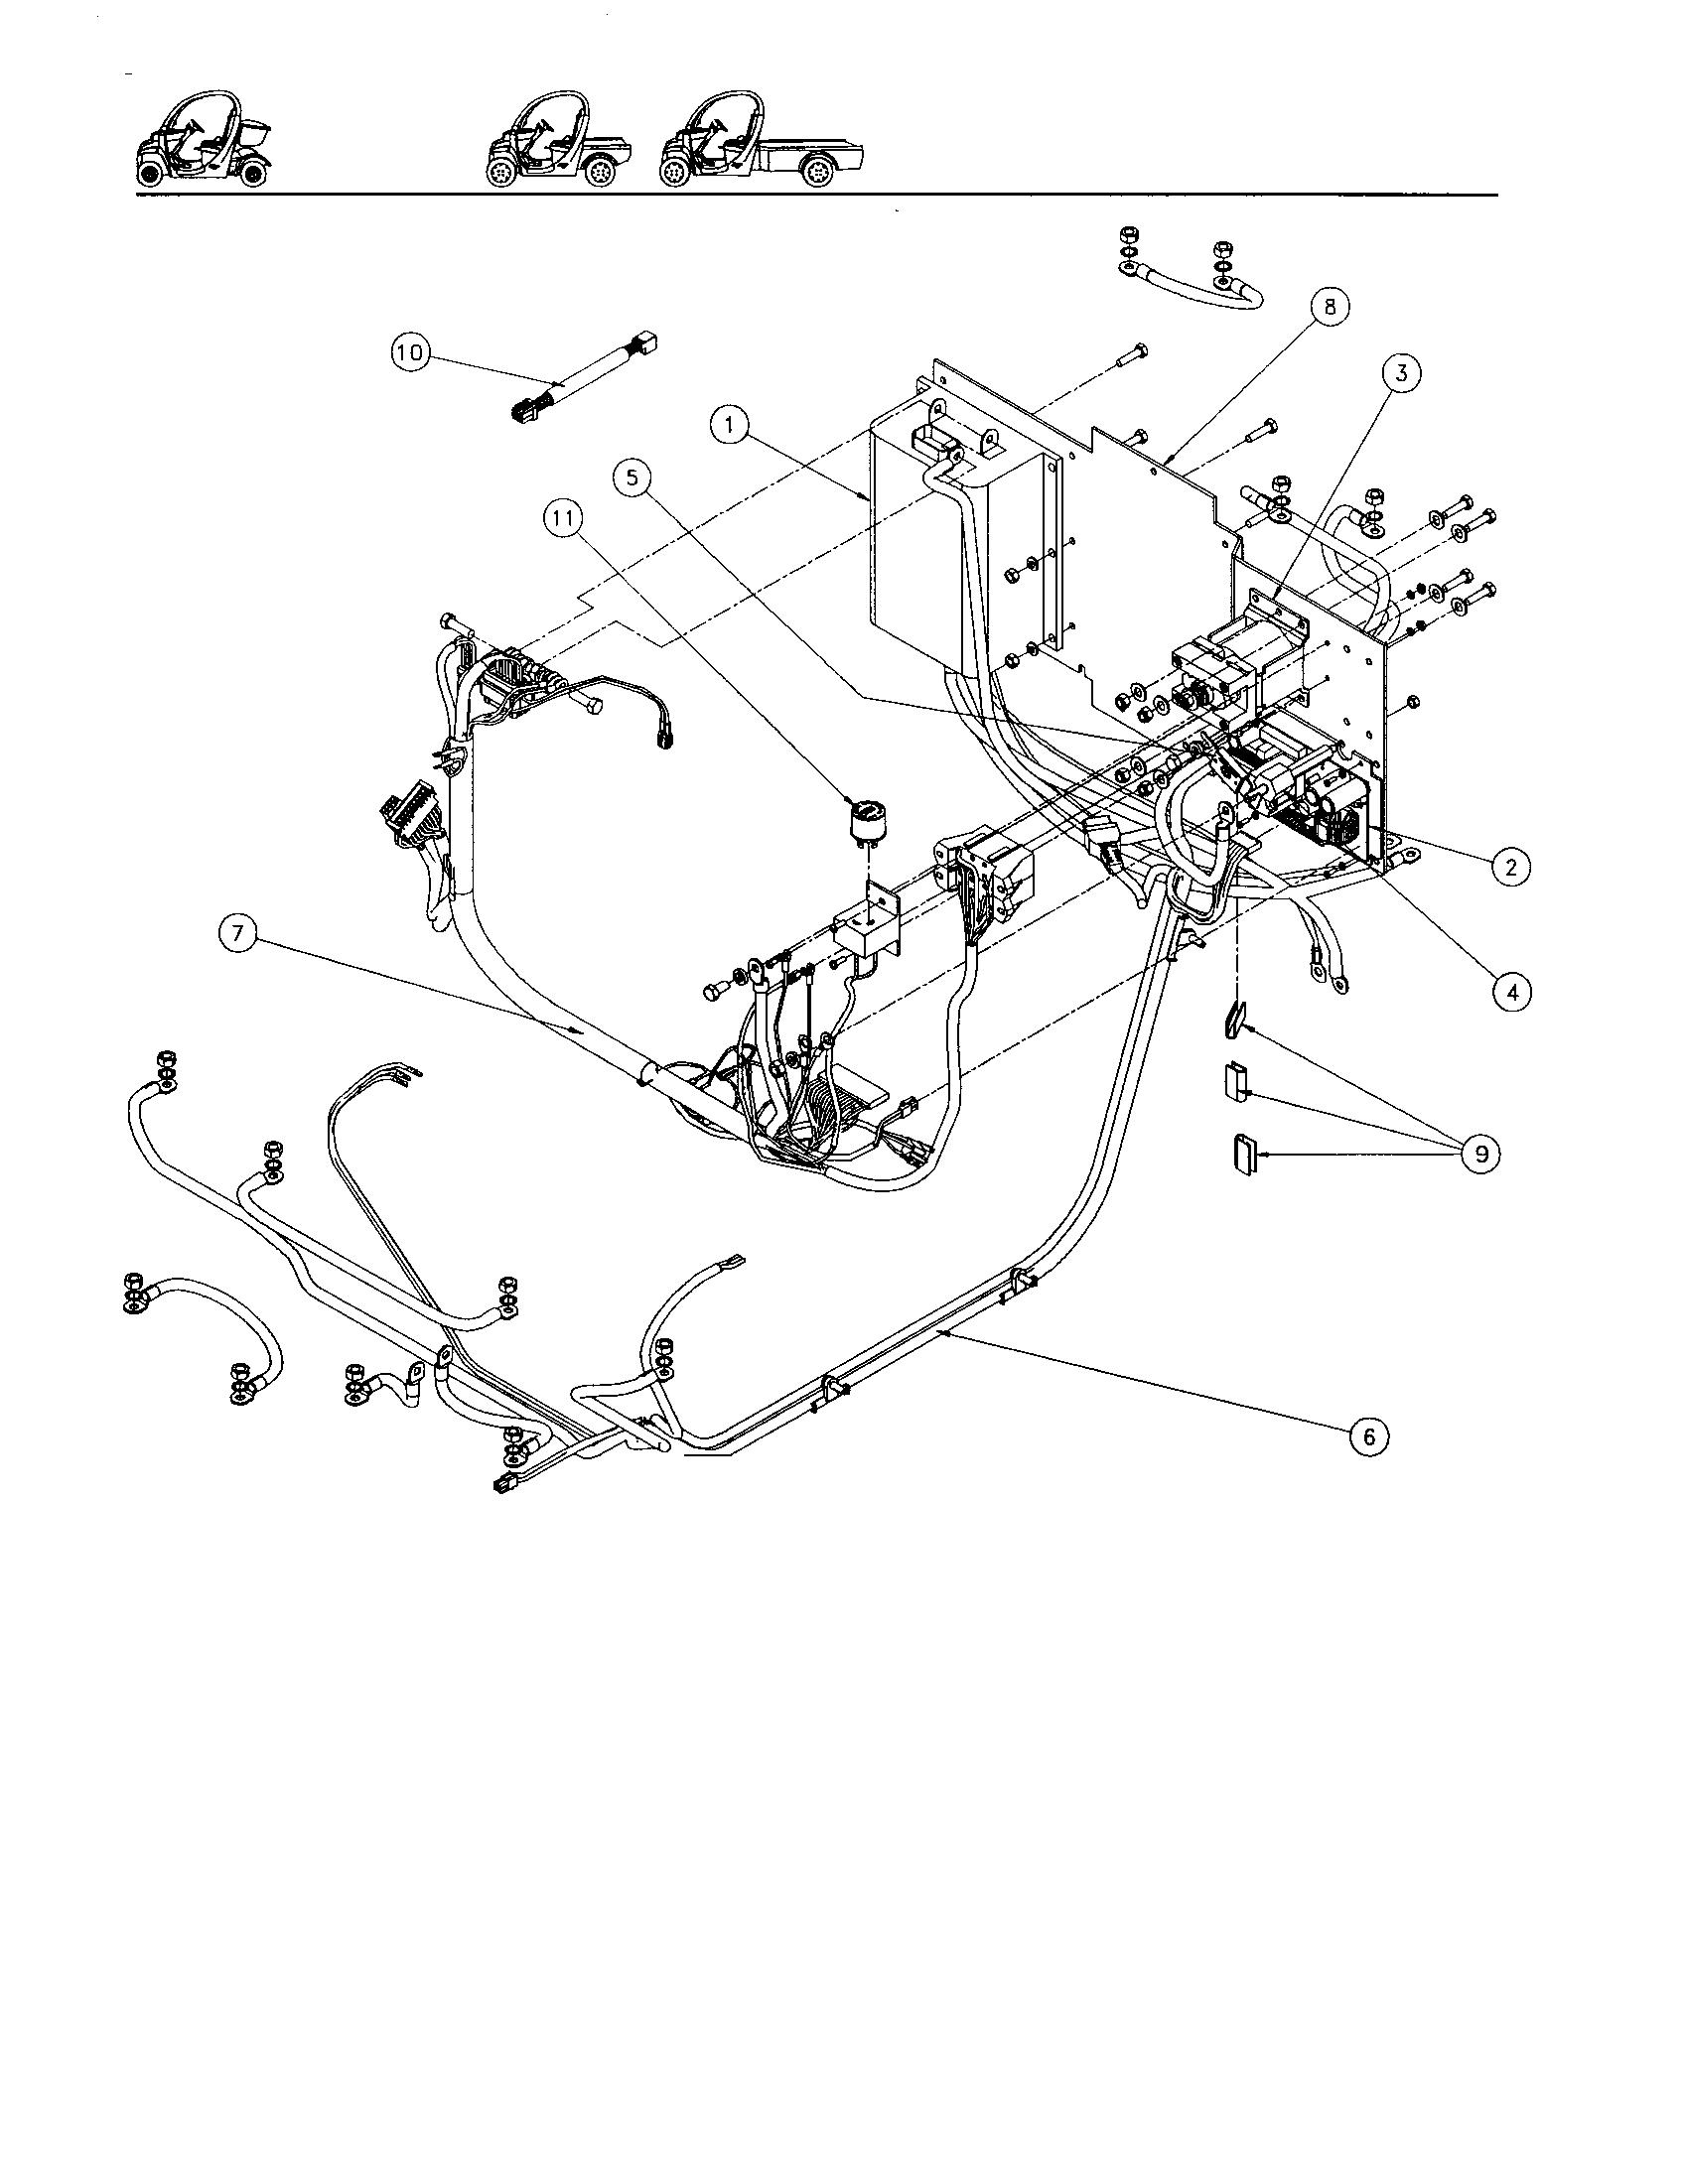 hight resolution of gem car e825 wiring diagram wiring diagram inside